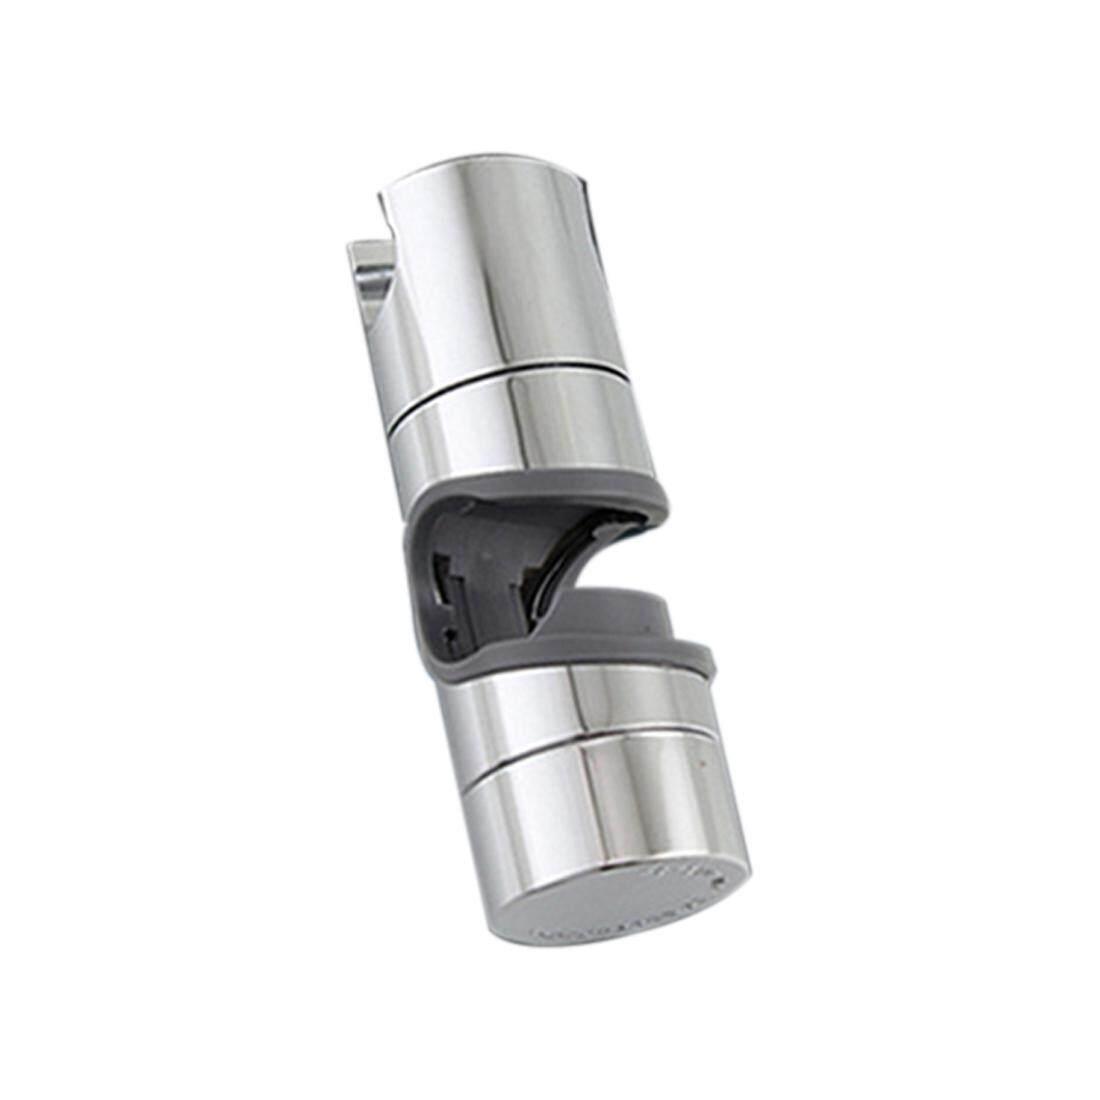 18~25mm Adjustable Abs Chrome Shower Rail Head Slider Holder Bracket Slide Clamp By Lolife.